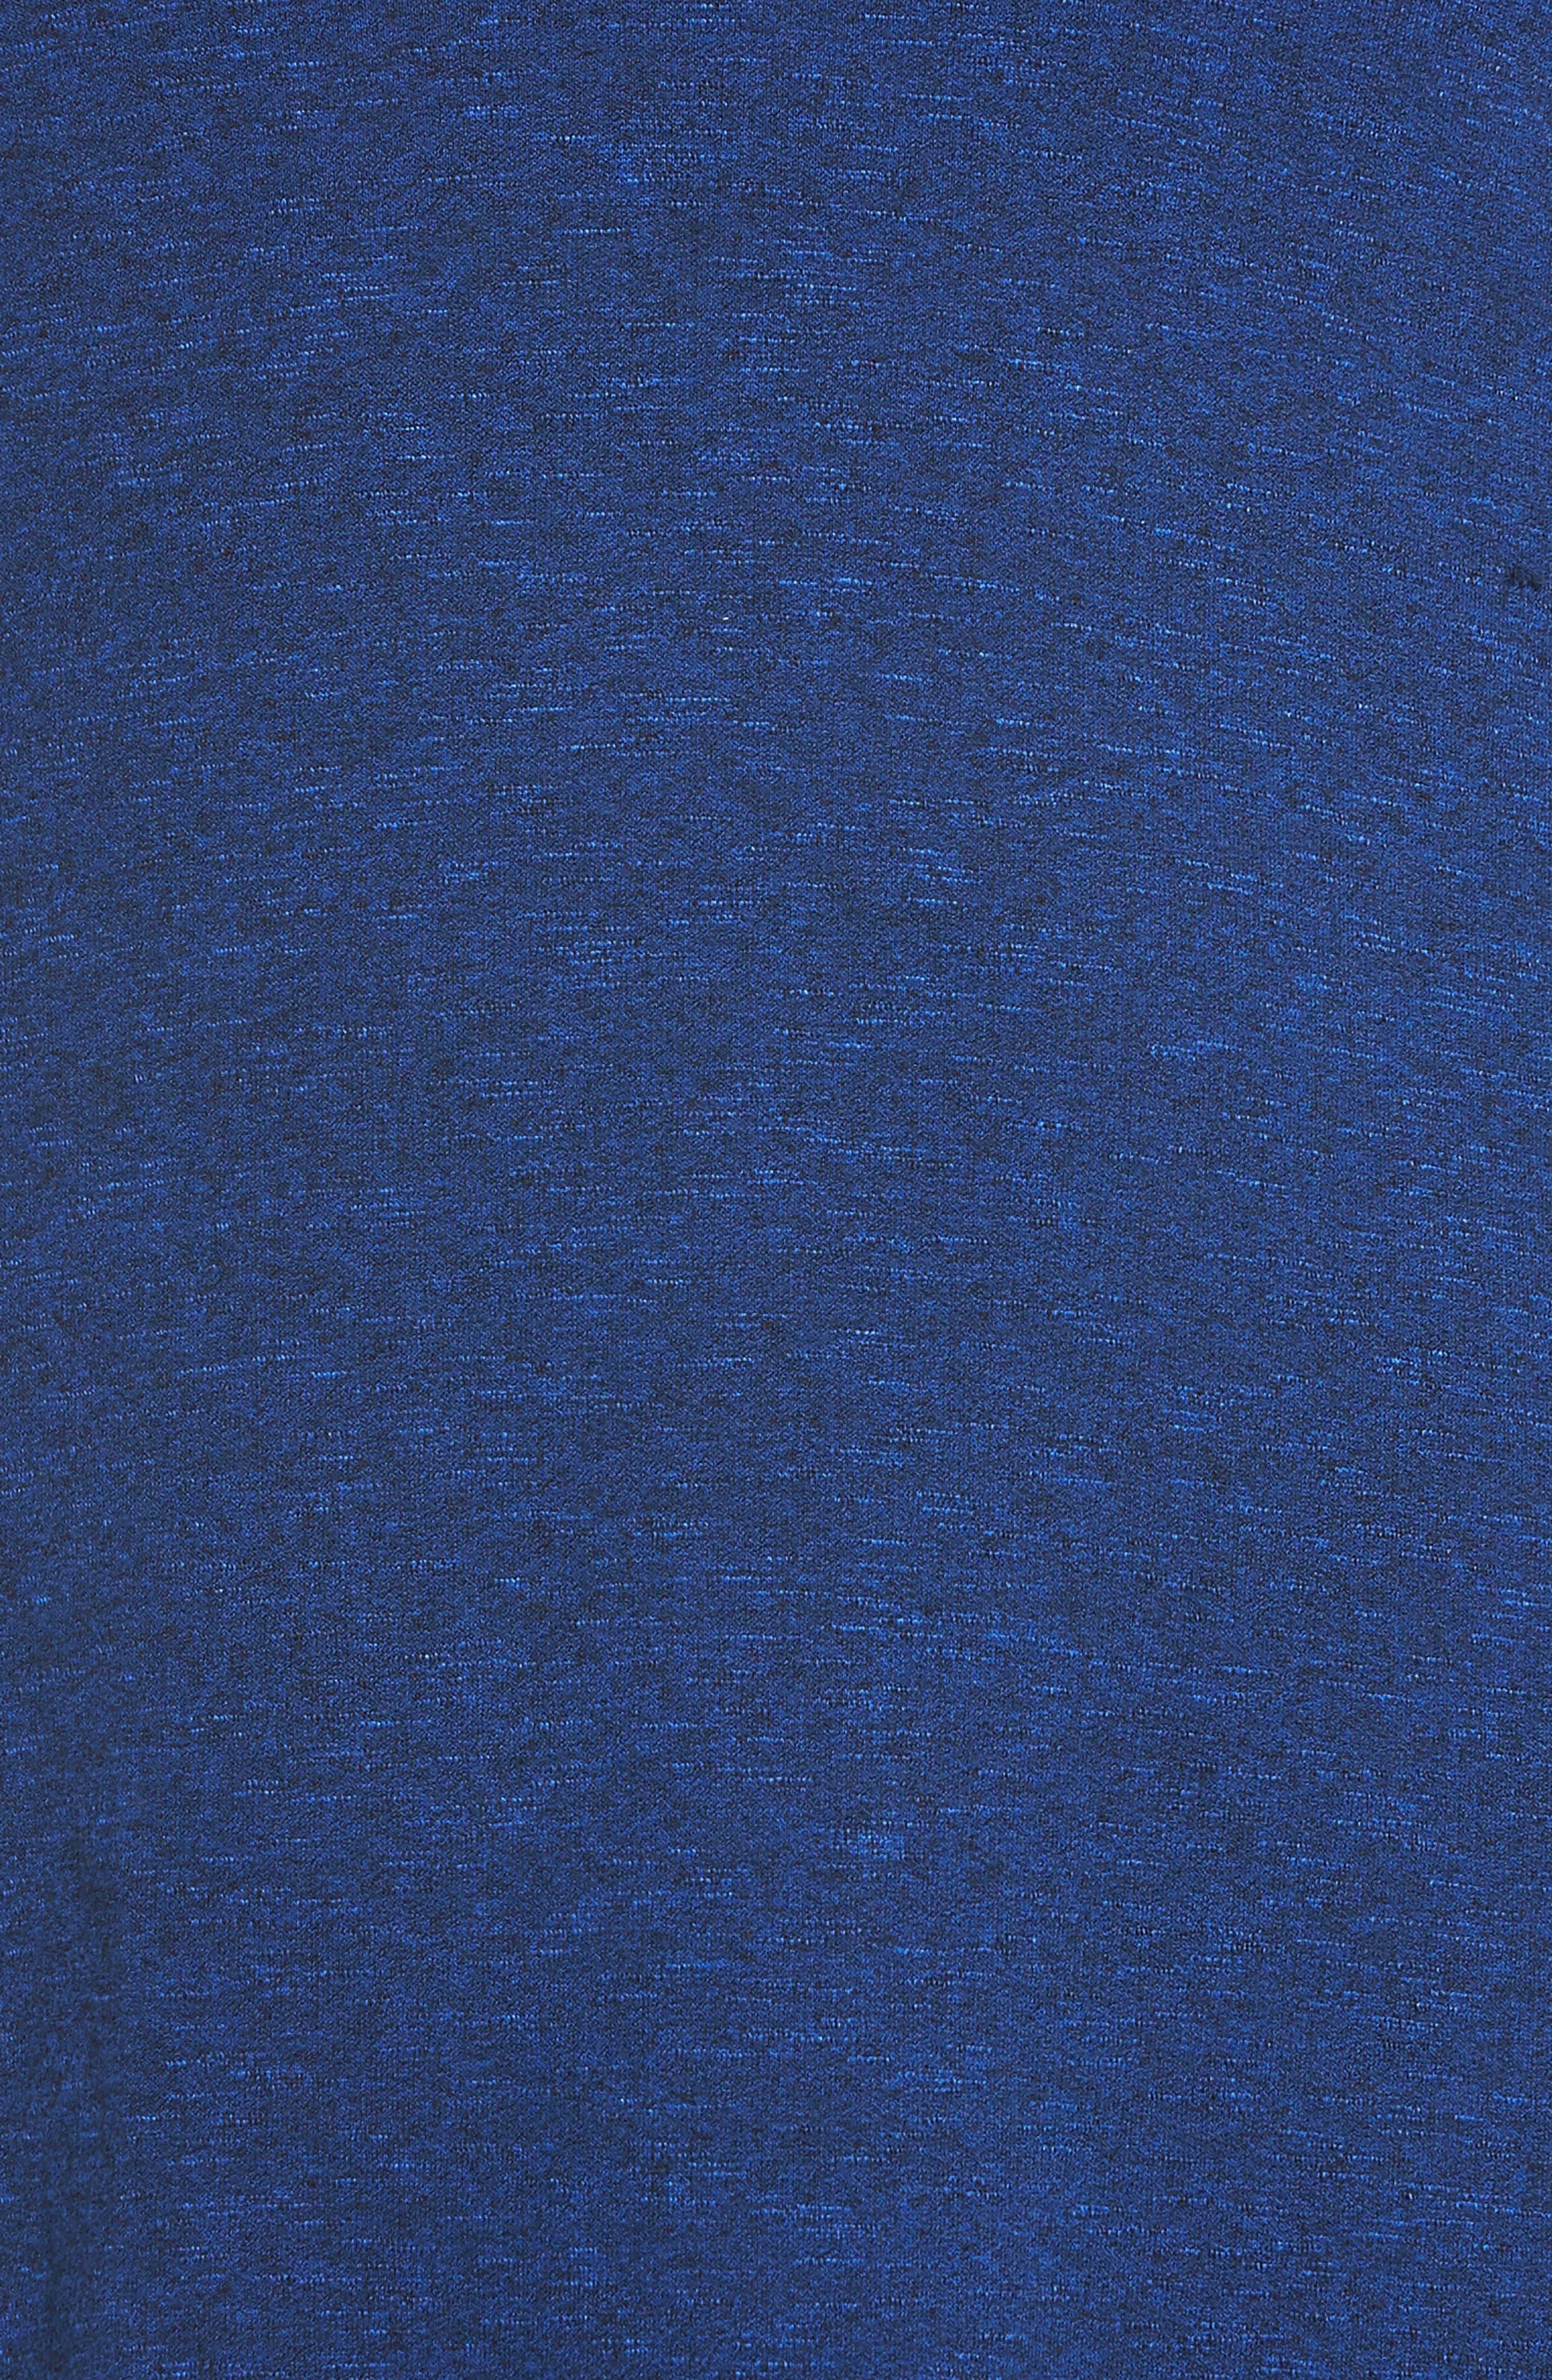 Knot Strap Knit Swing Dress,                             Alternate thumbnail 6, color,                             Cobalt Blue Slub Terry